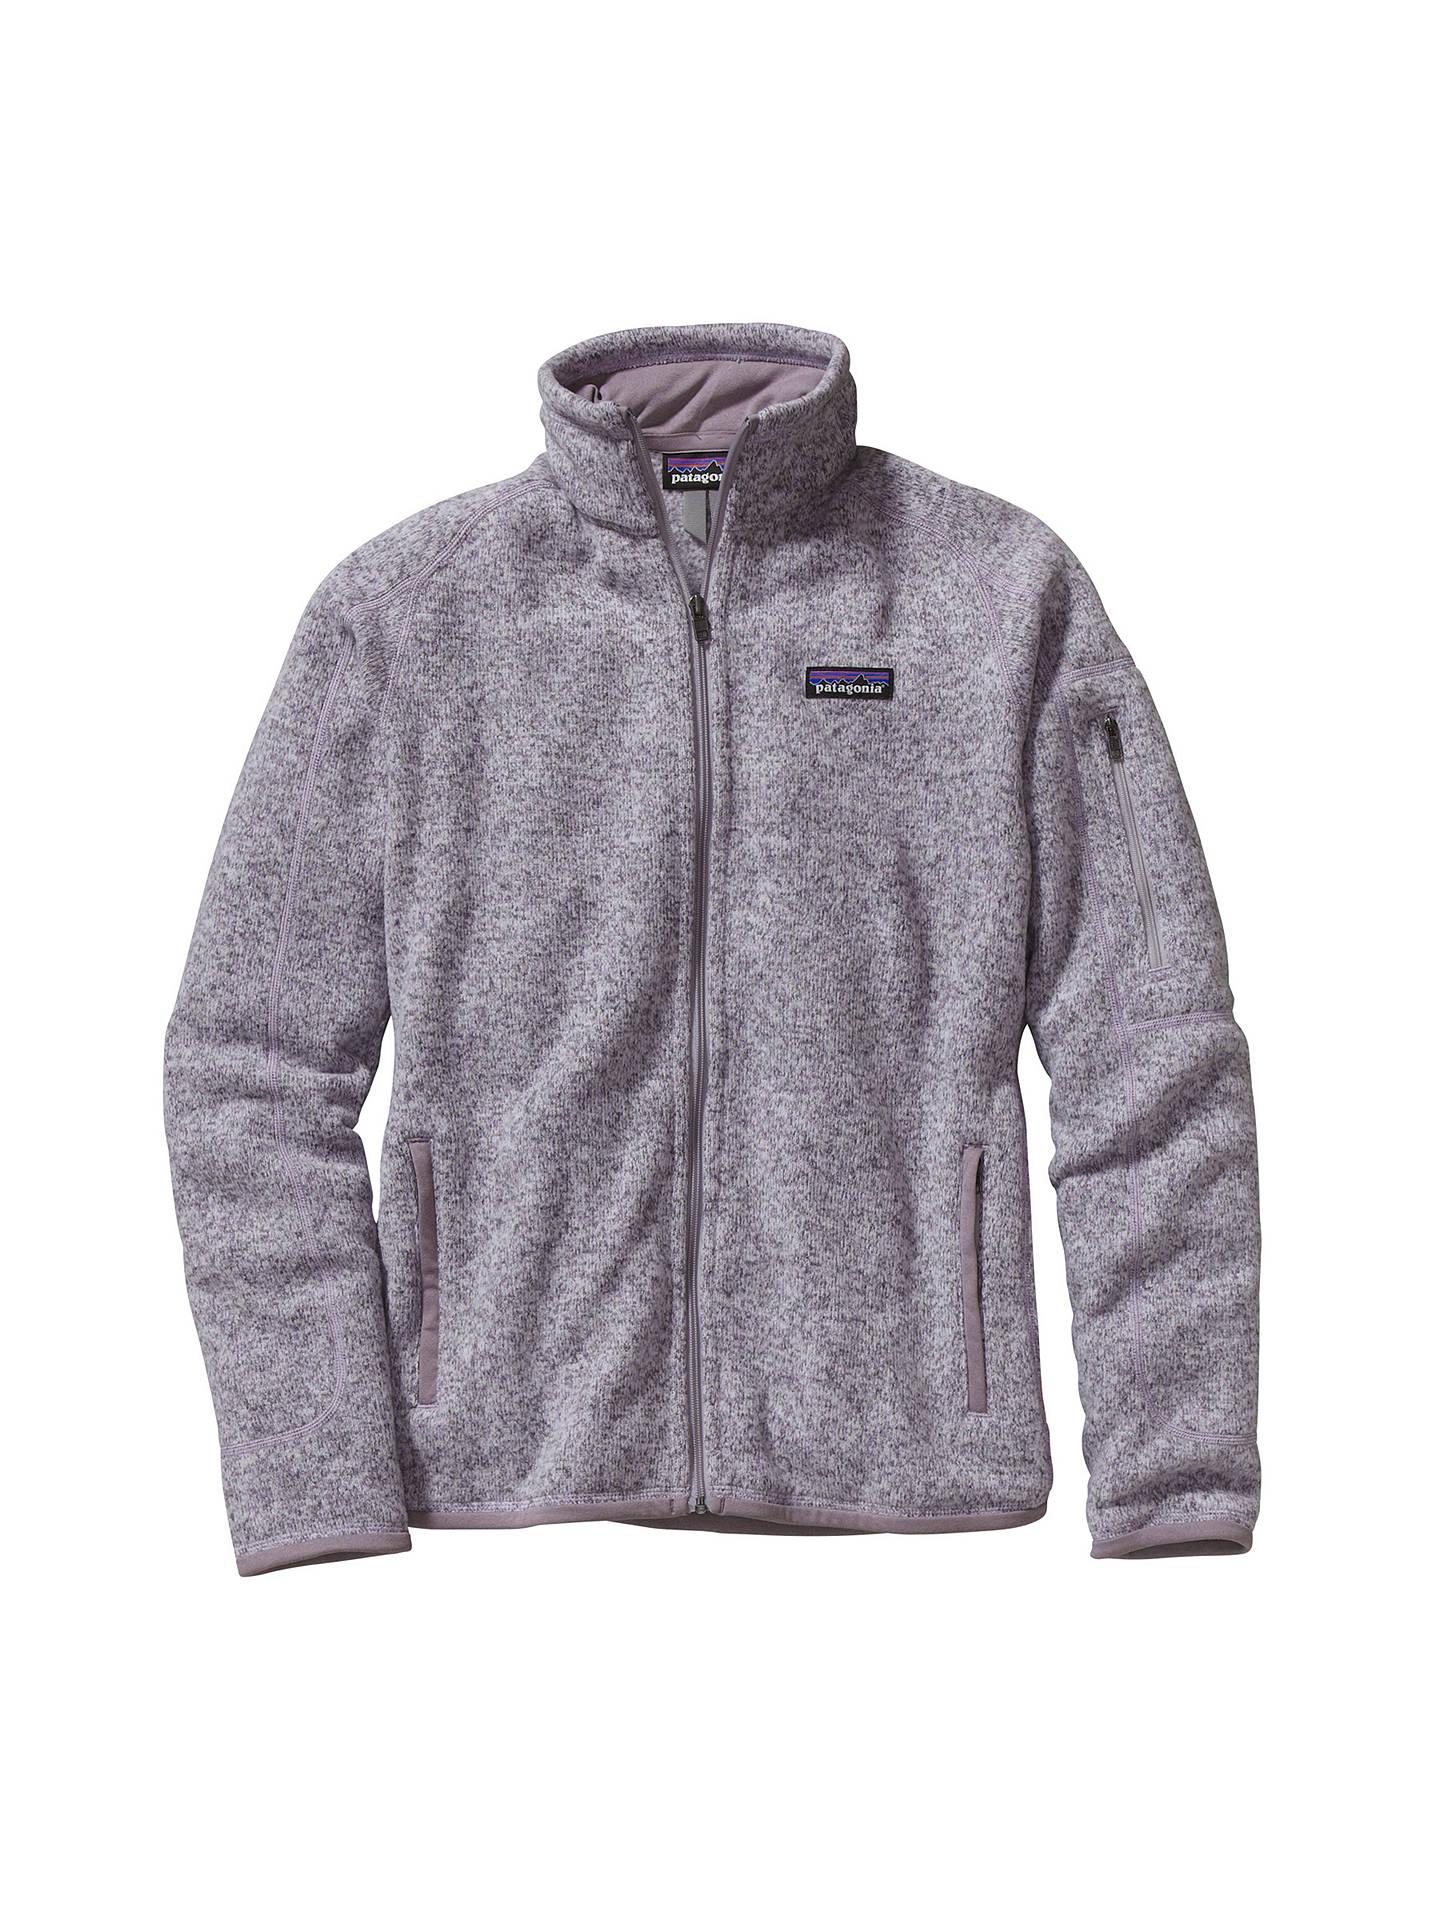 1d8be53eff4 Buy Patagonia Better Sweater Women s Fleece Jacket